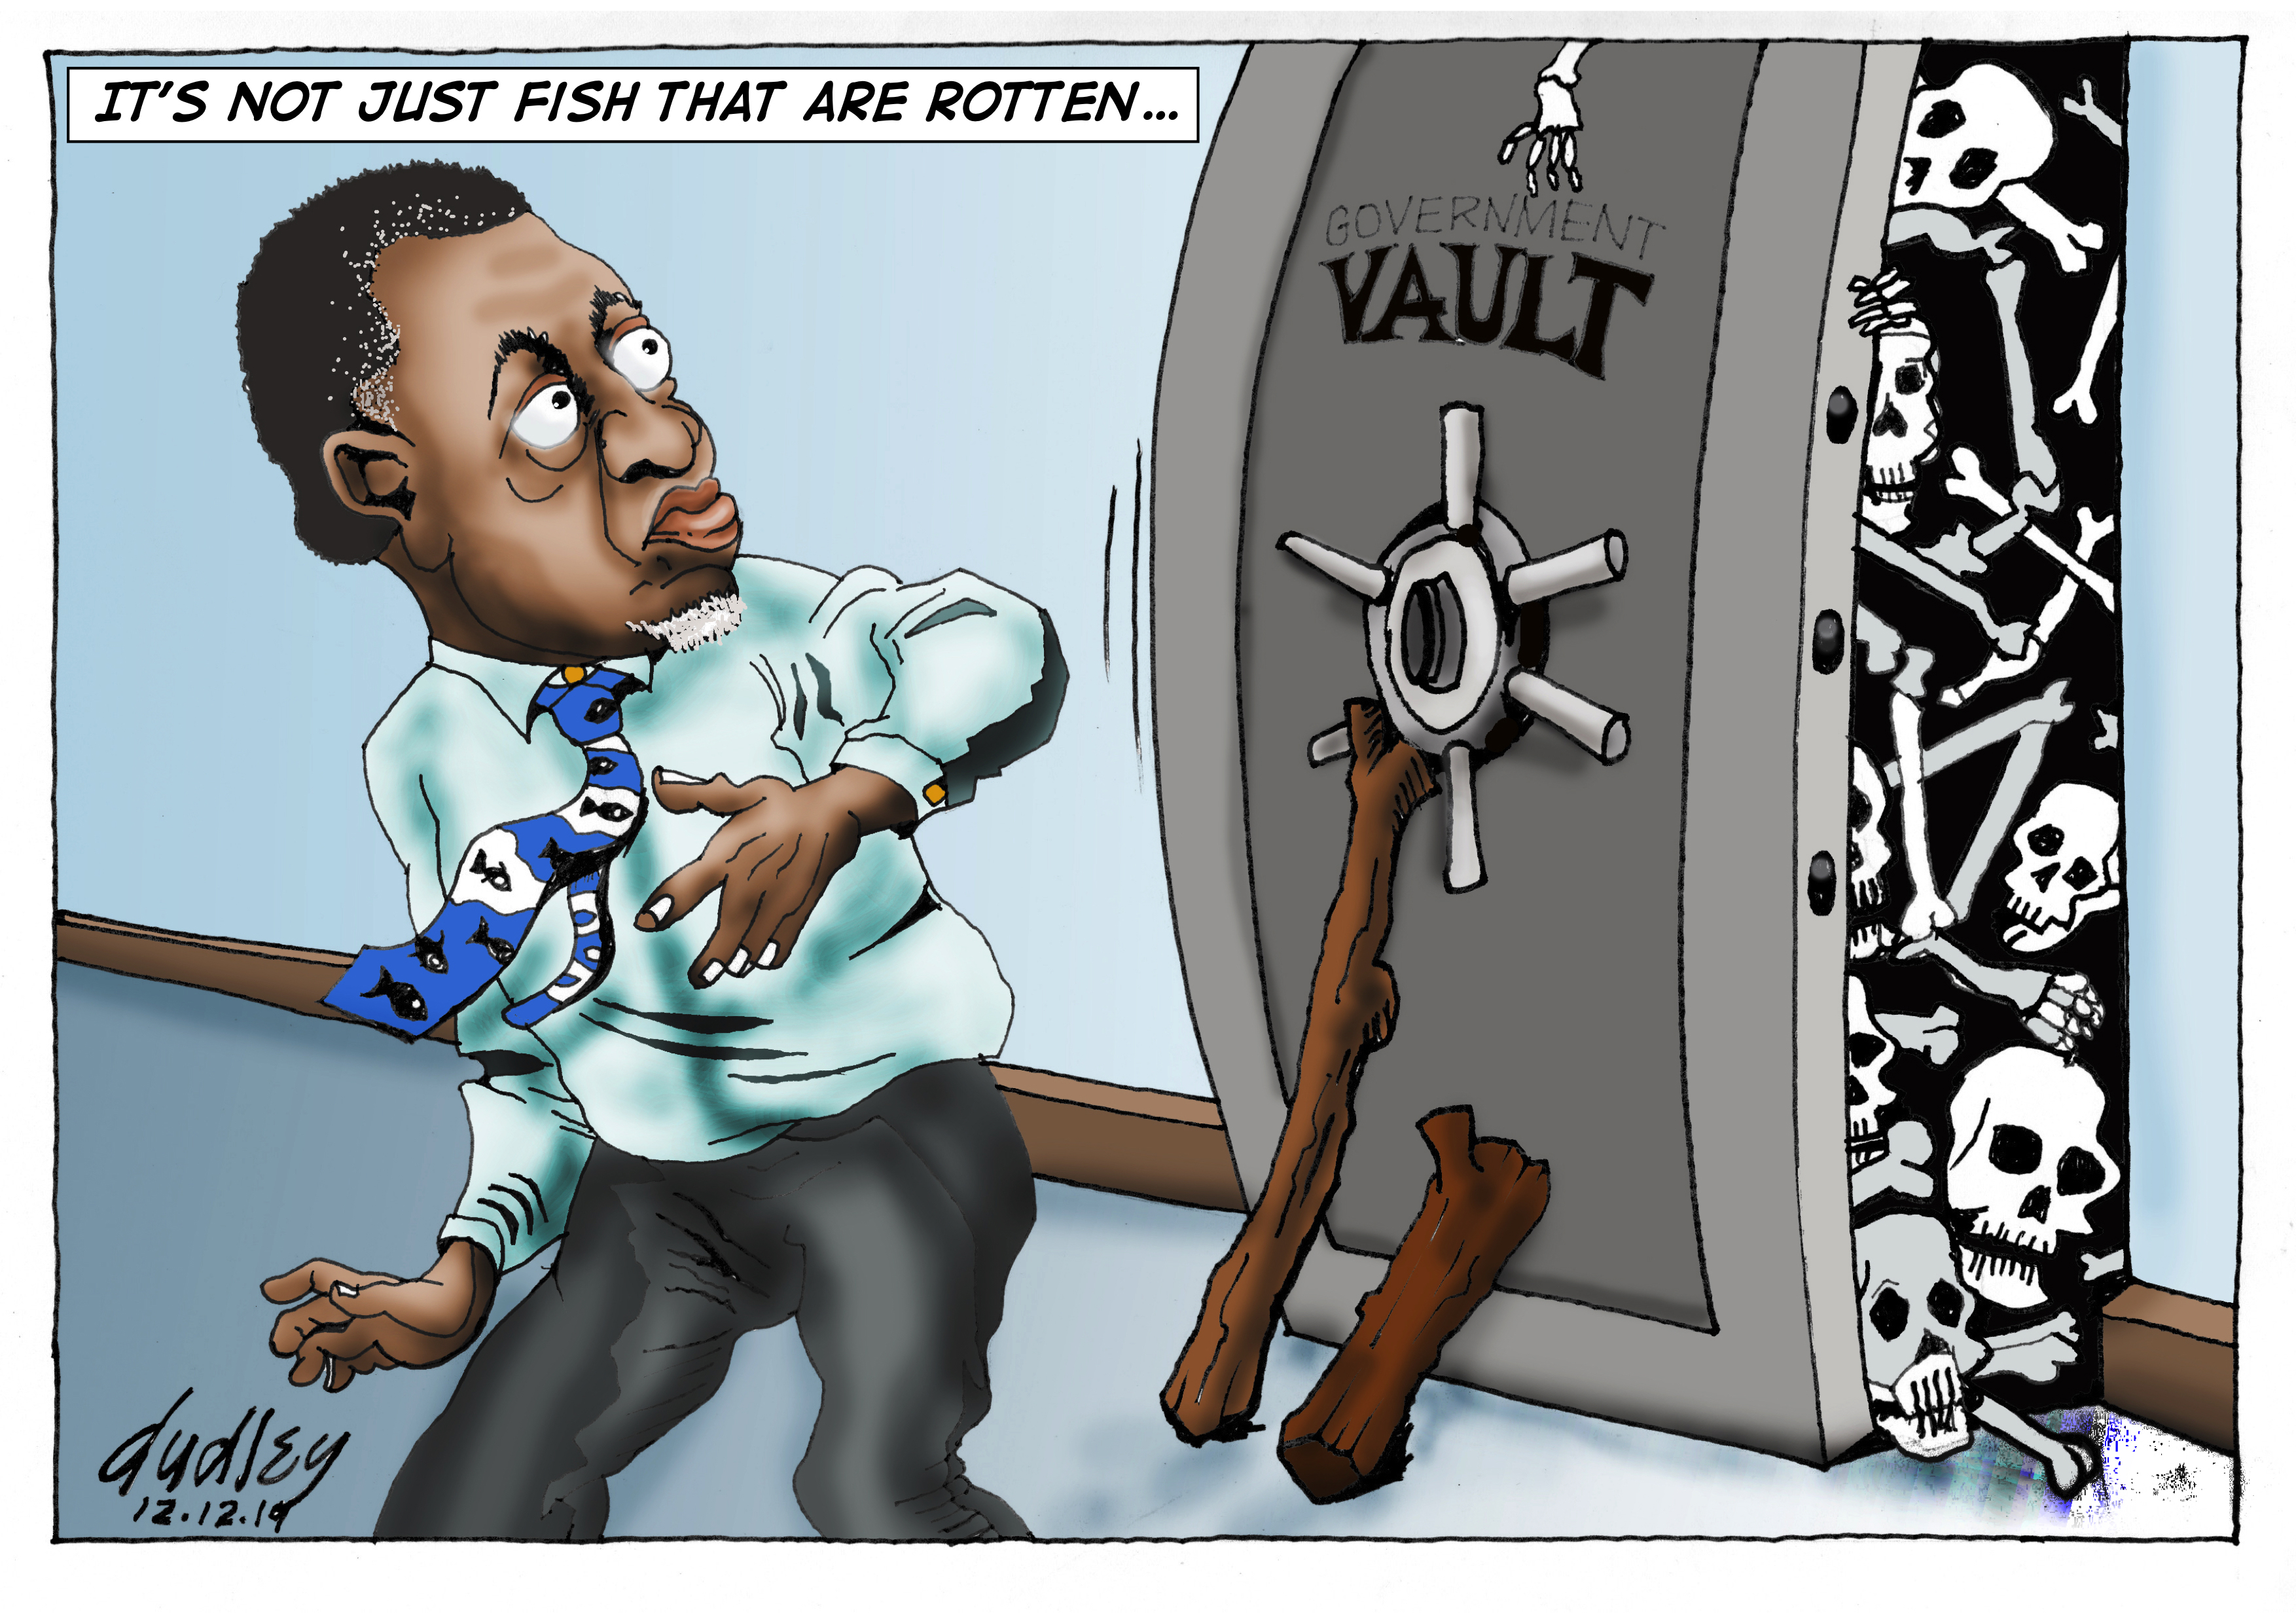 Government Vault